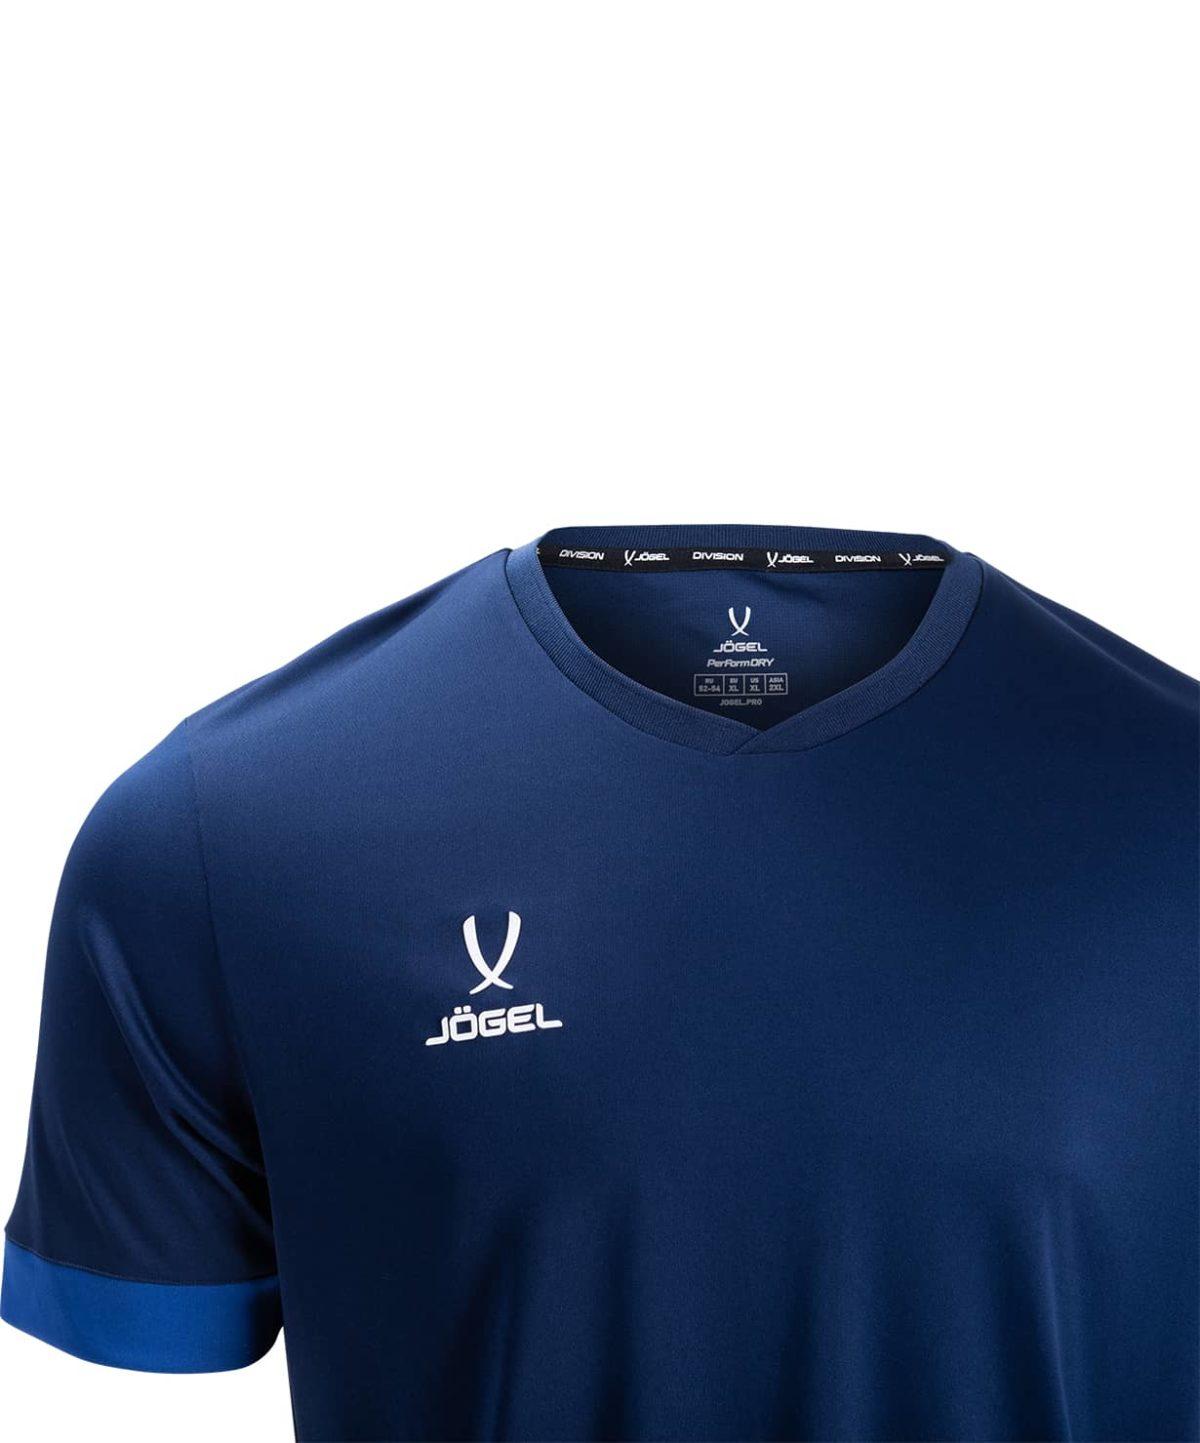 JOGEL DIVISION футболка футбольная Union Jersey: т.синий/синий/белый - 3